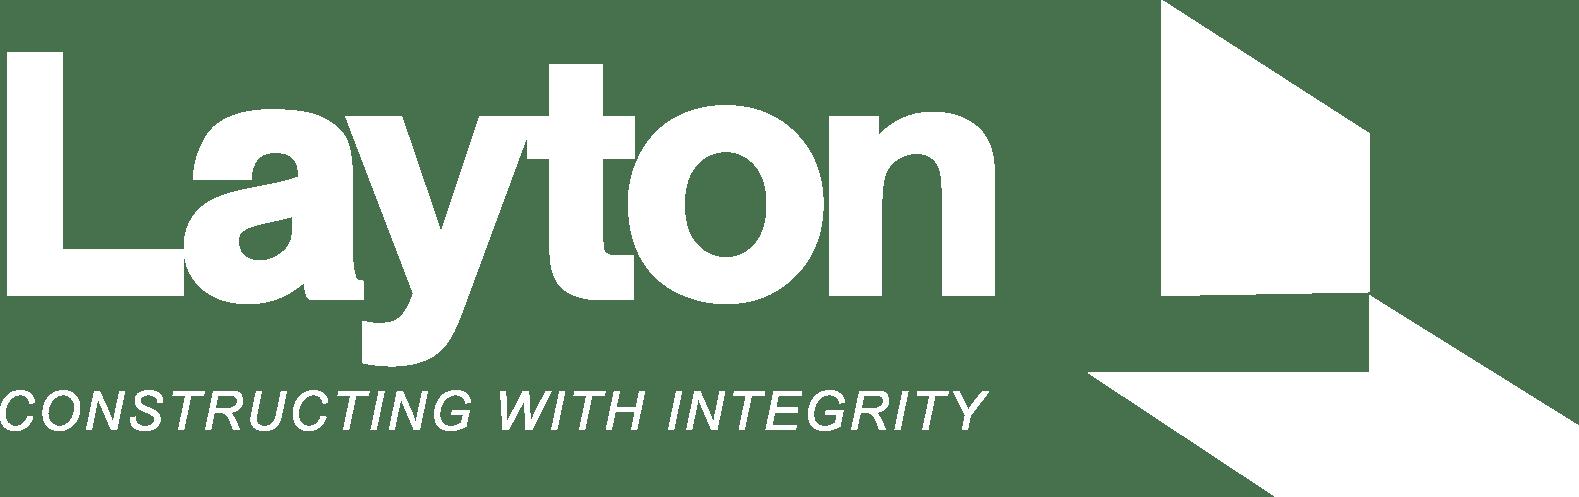 Layton Construction Logo